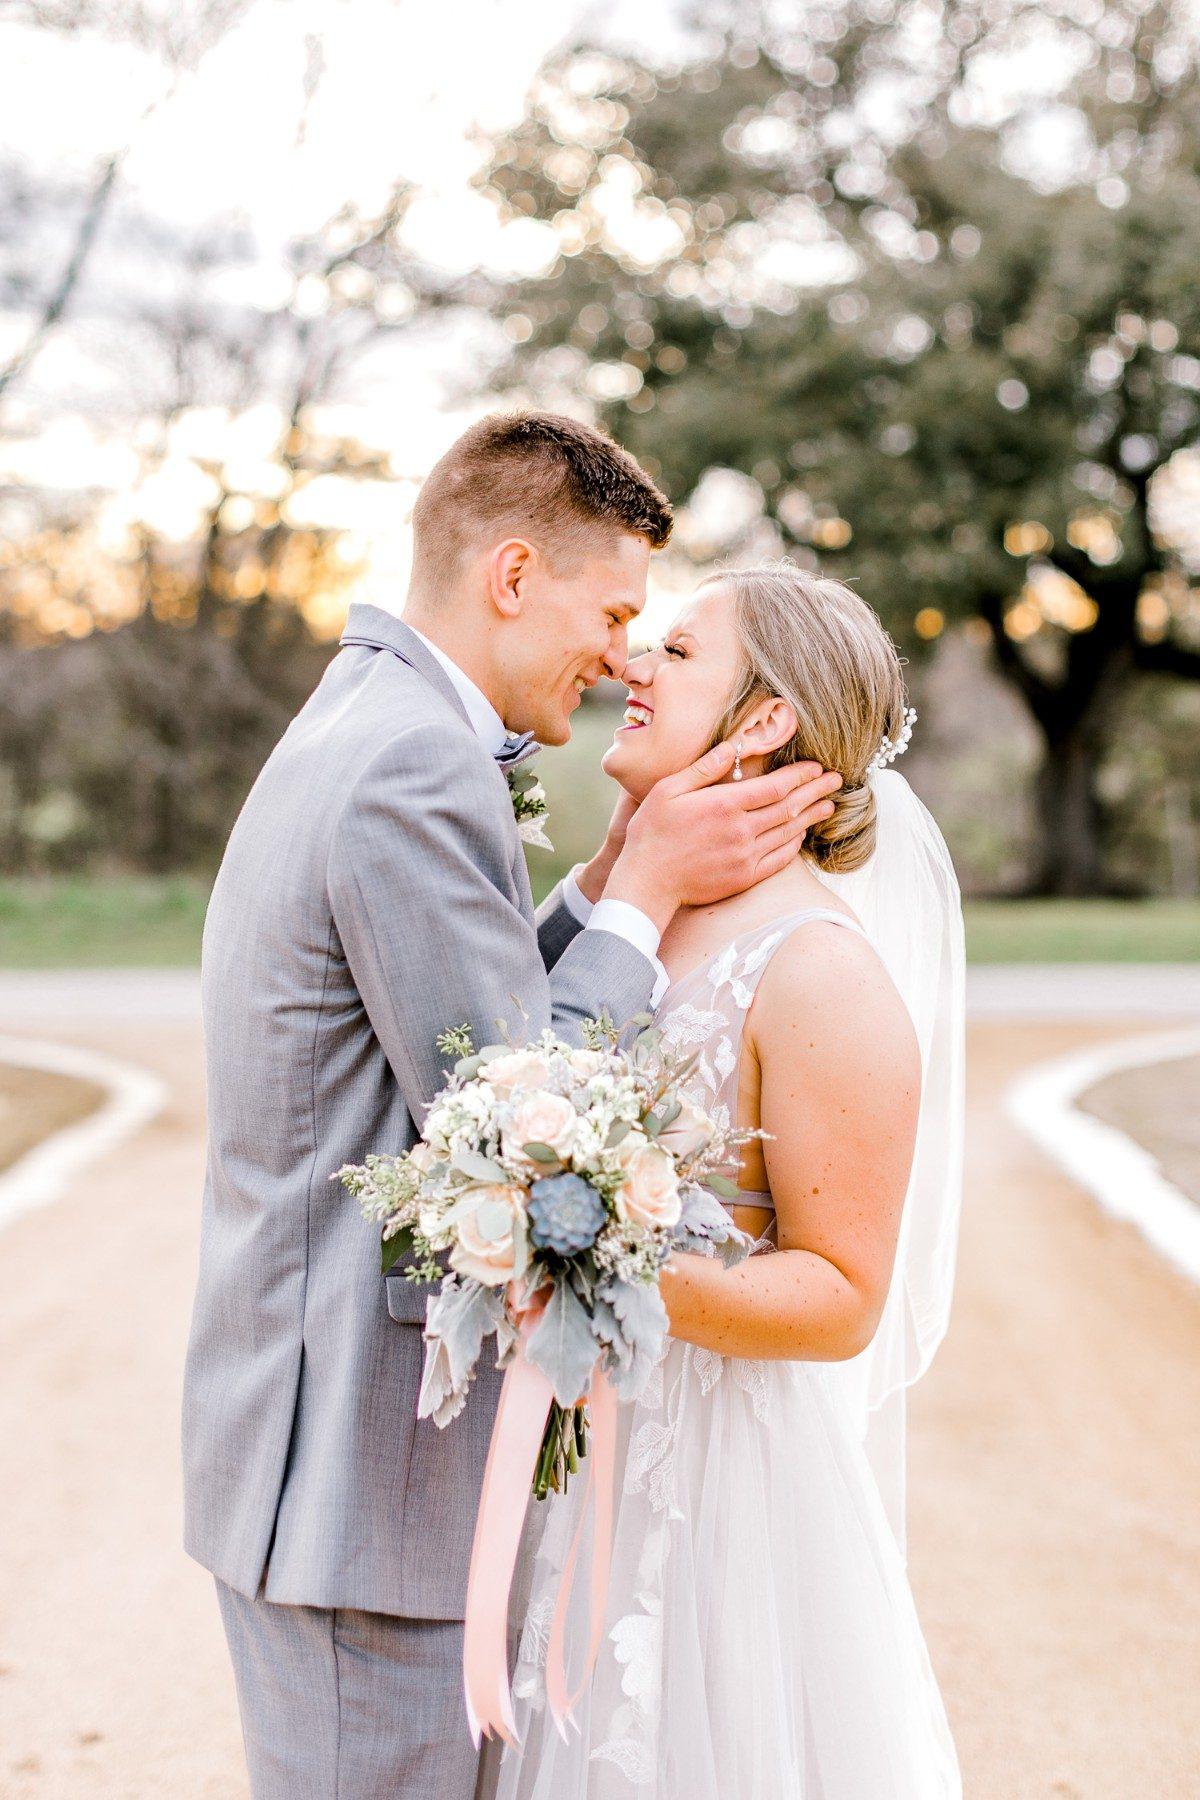 ennis-texas-wedding-photographer-kaitlyn-bullard-104.jpg